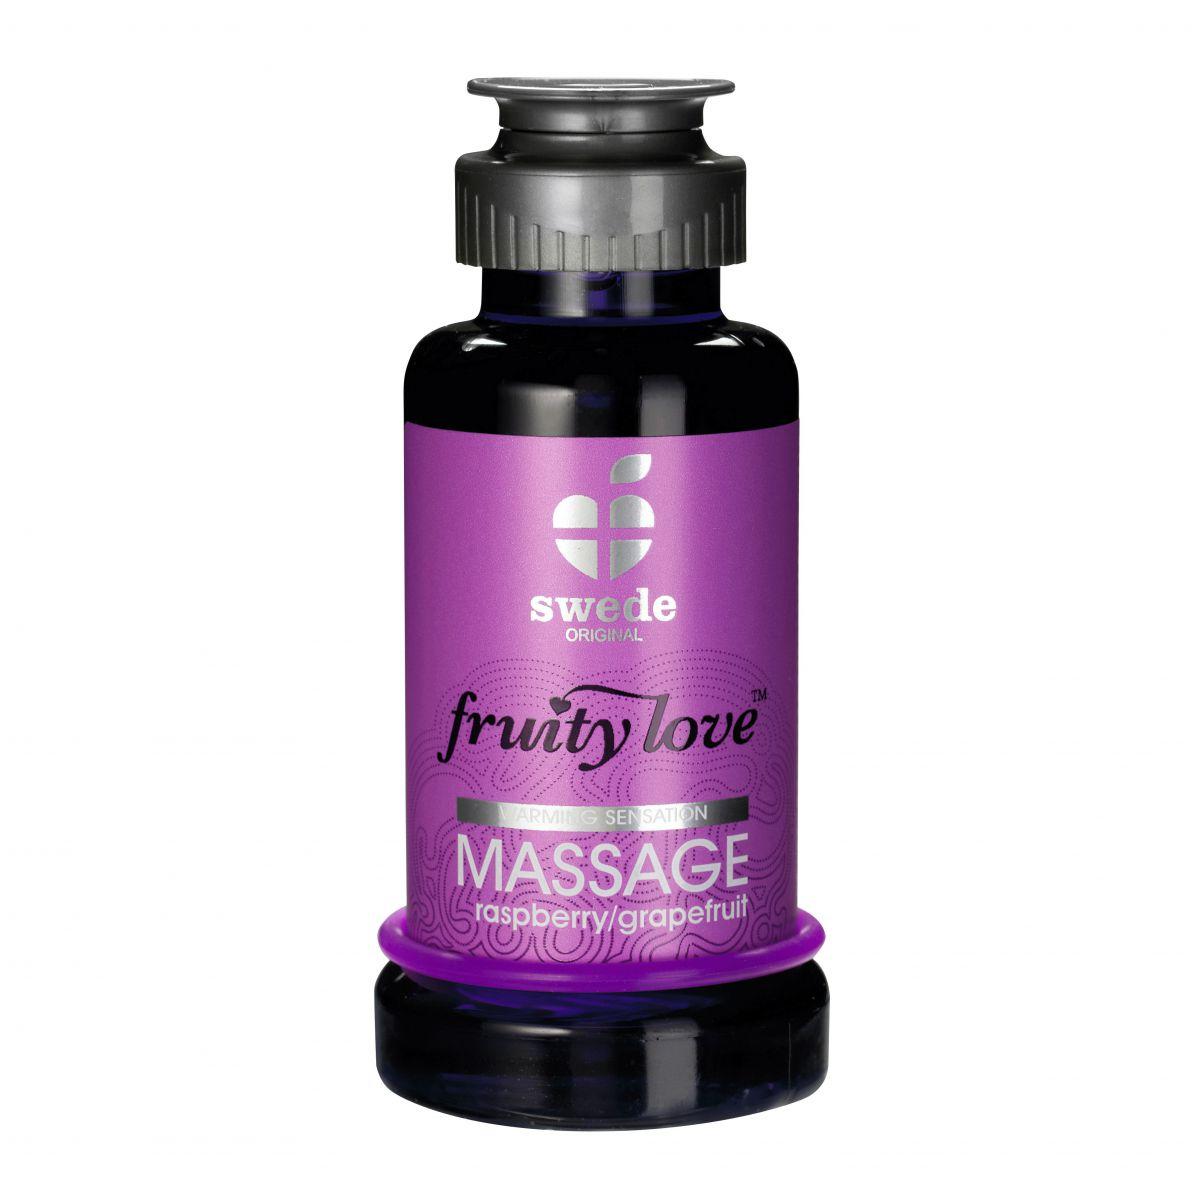 Лосьон для массажа Swede Fruity Love Massage Raspberry/Grapefruit с ароматом малины и грейпфрута - 100 мл.